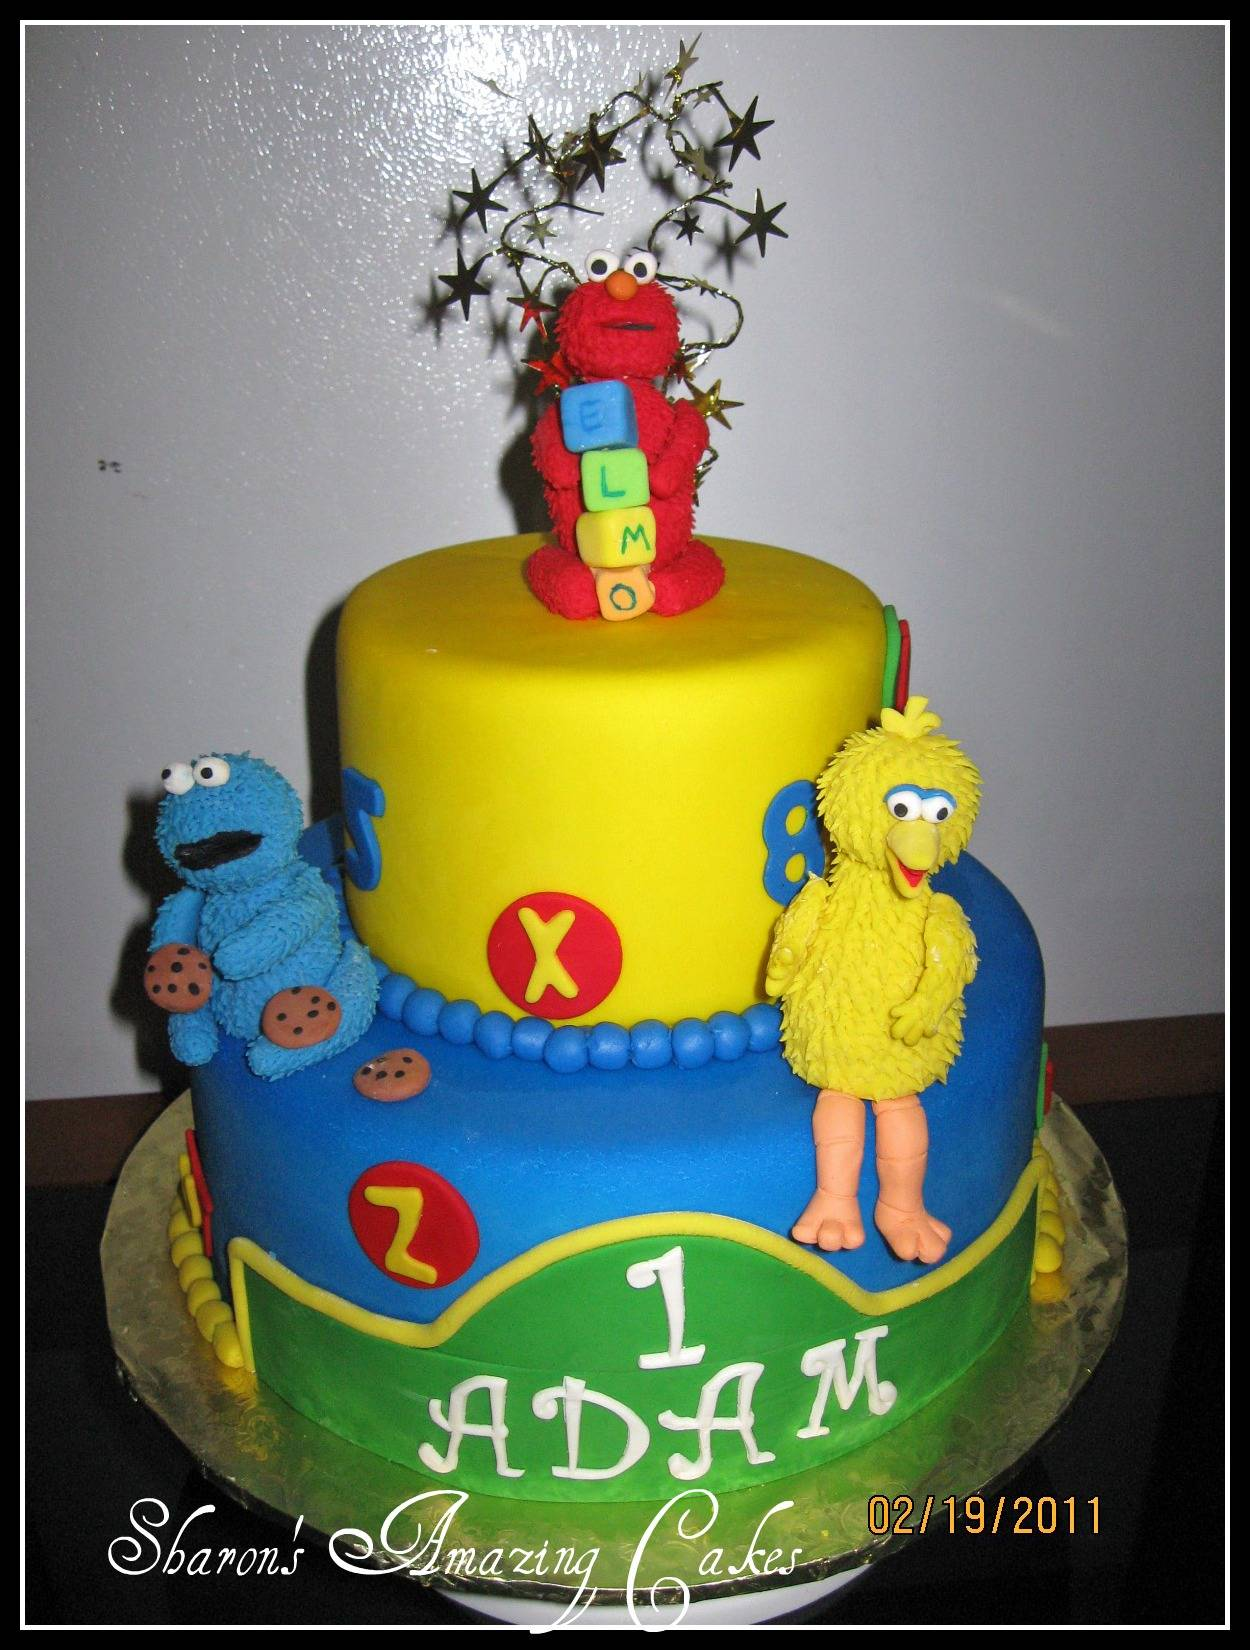 CAKE 23A1 -Sesame Street Cake